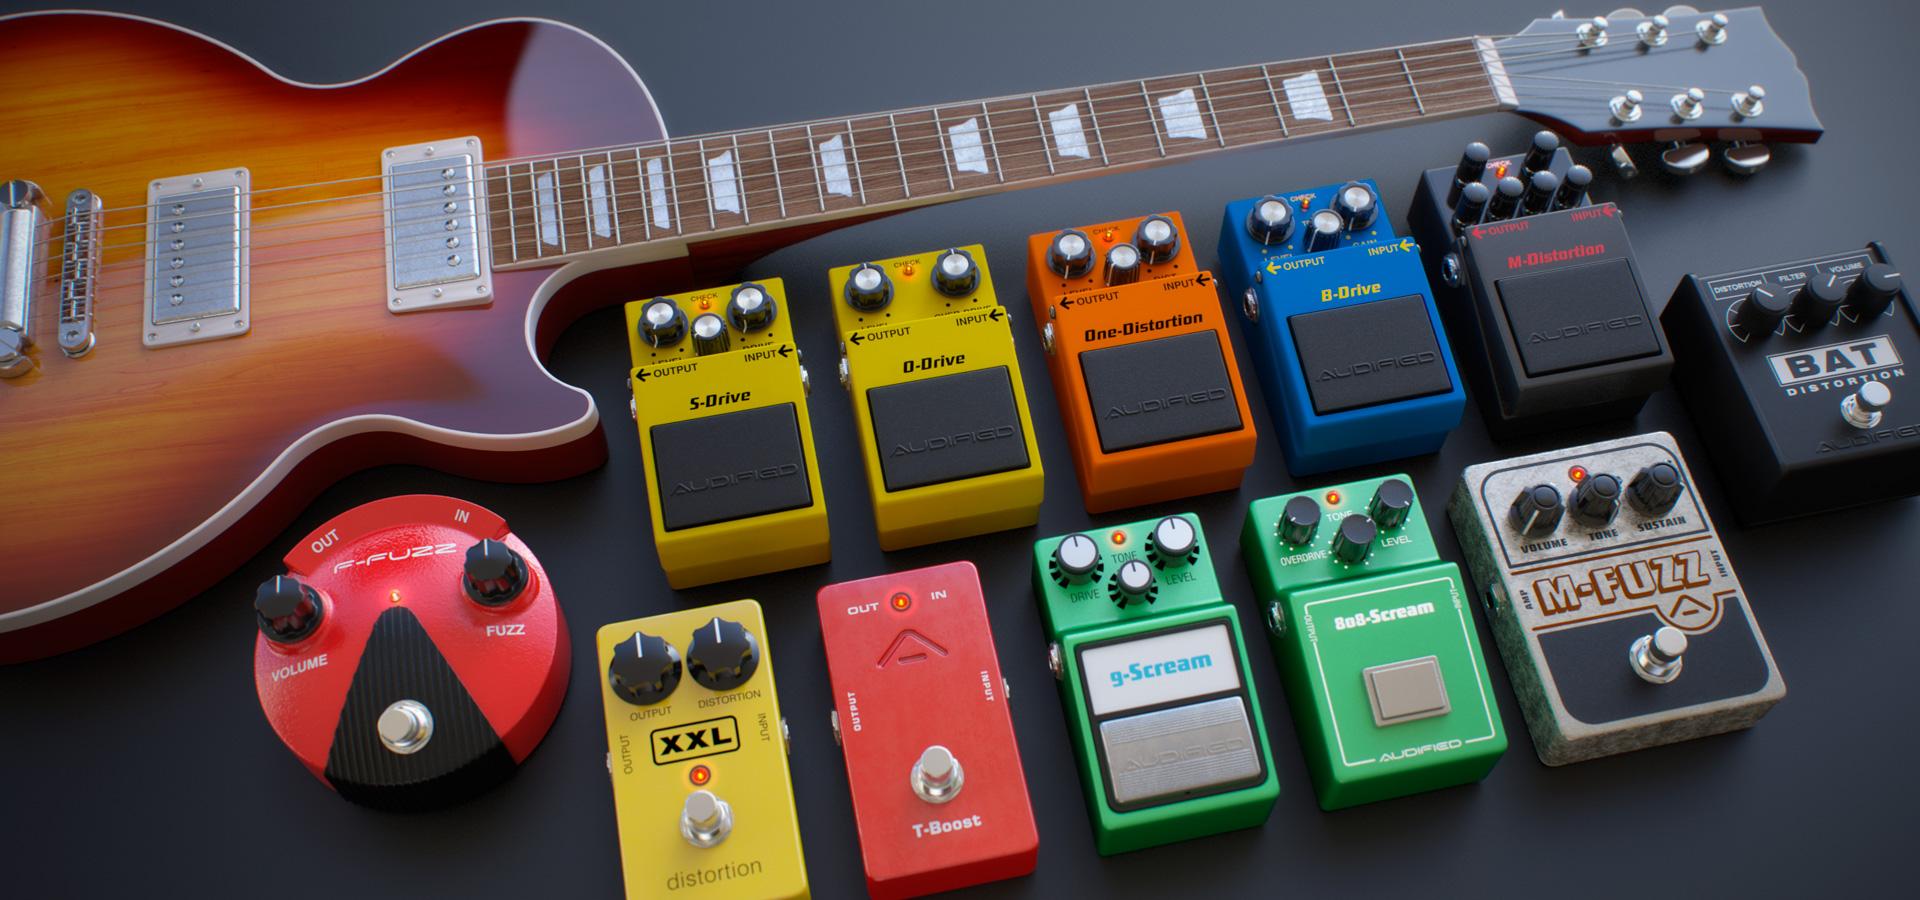 kvr multidrive pedal pro le by audified guitar effect pedal vst plugin audio units plugin. Black Bedroom Furniture Sets. Home Design Ideas